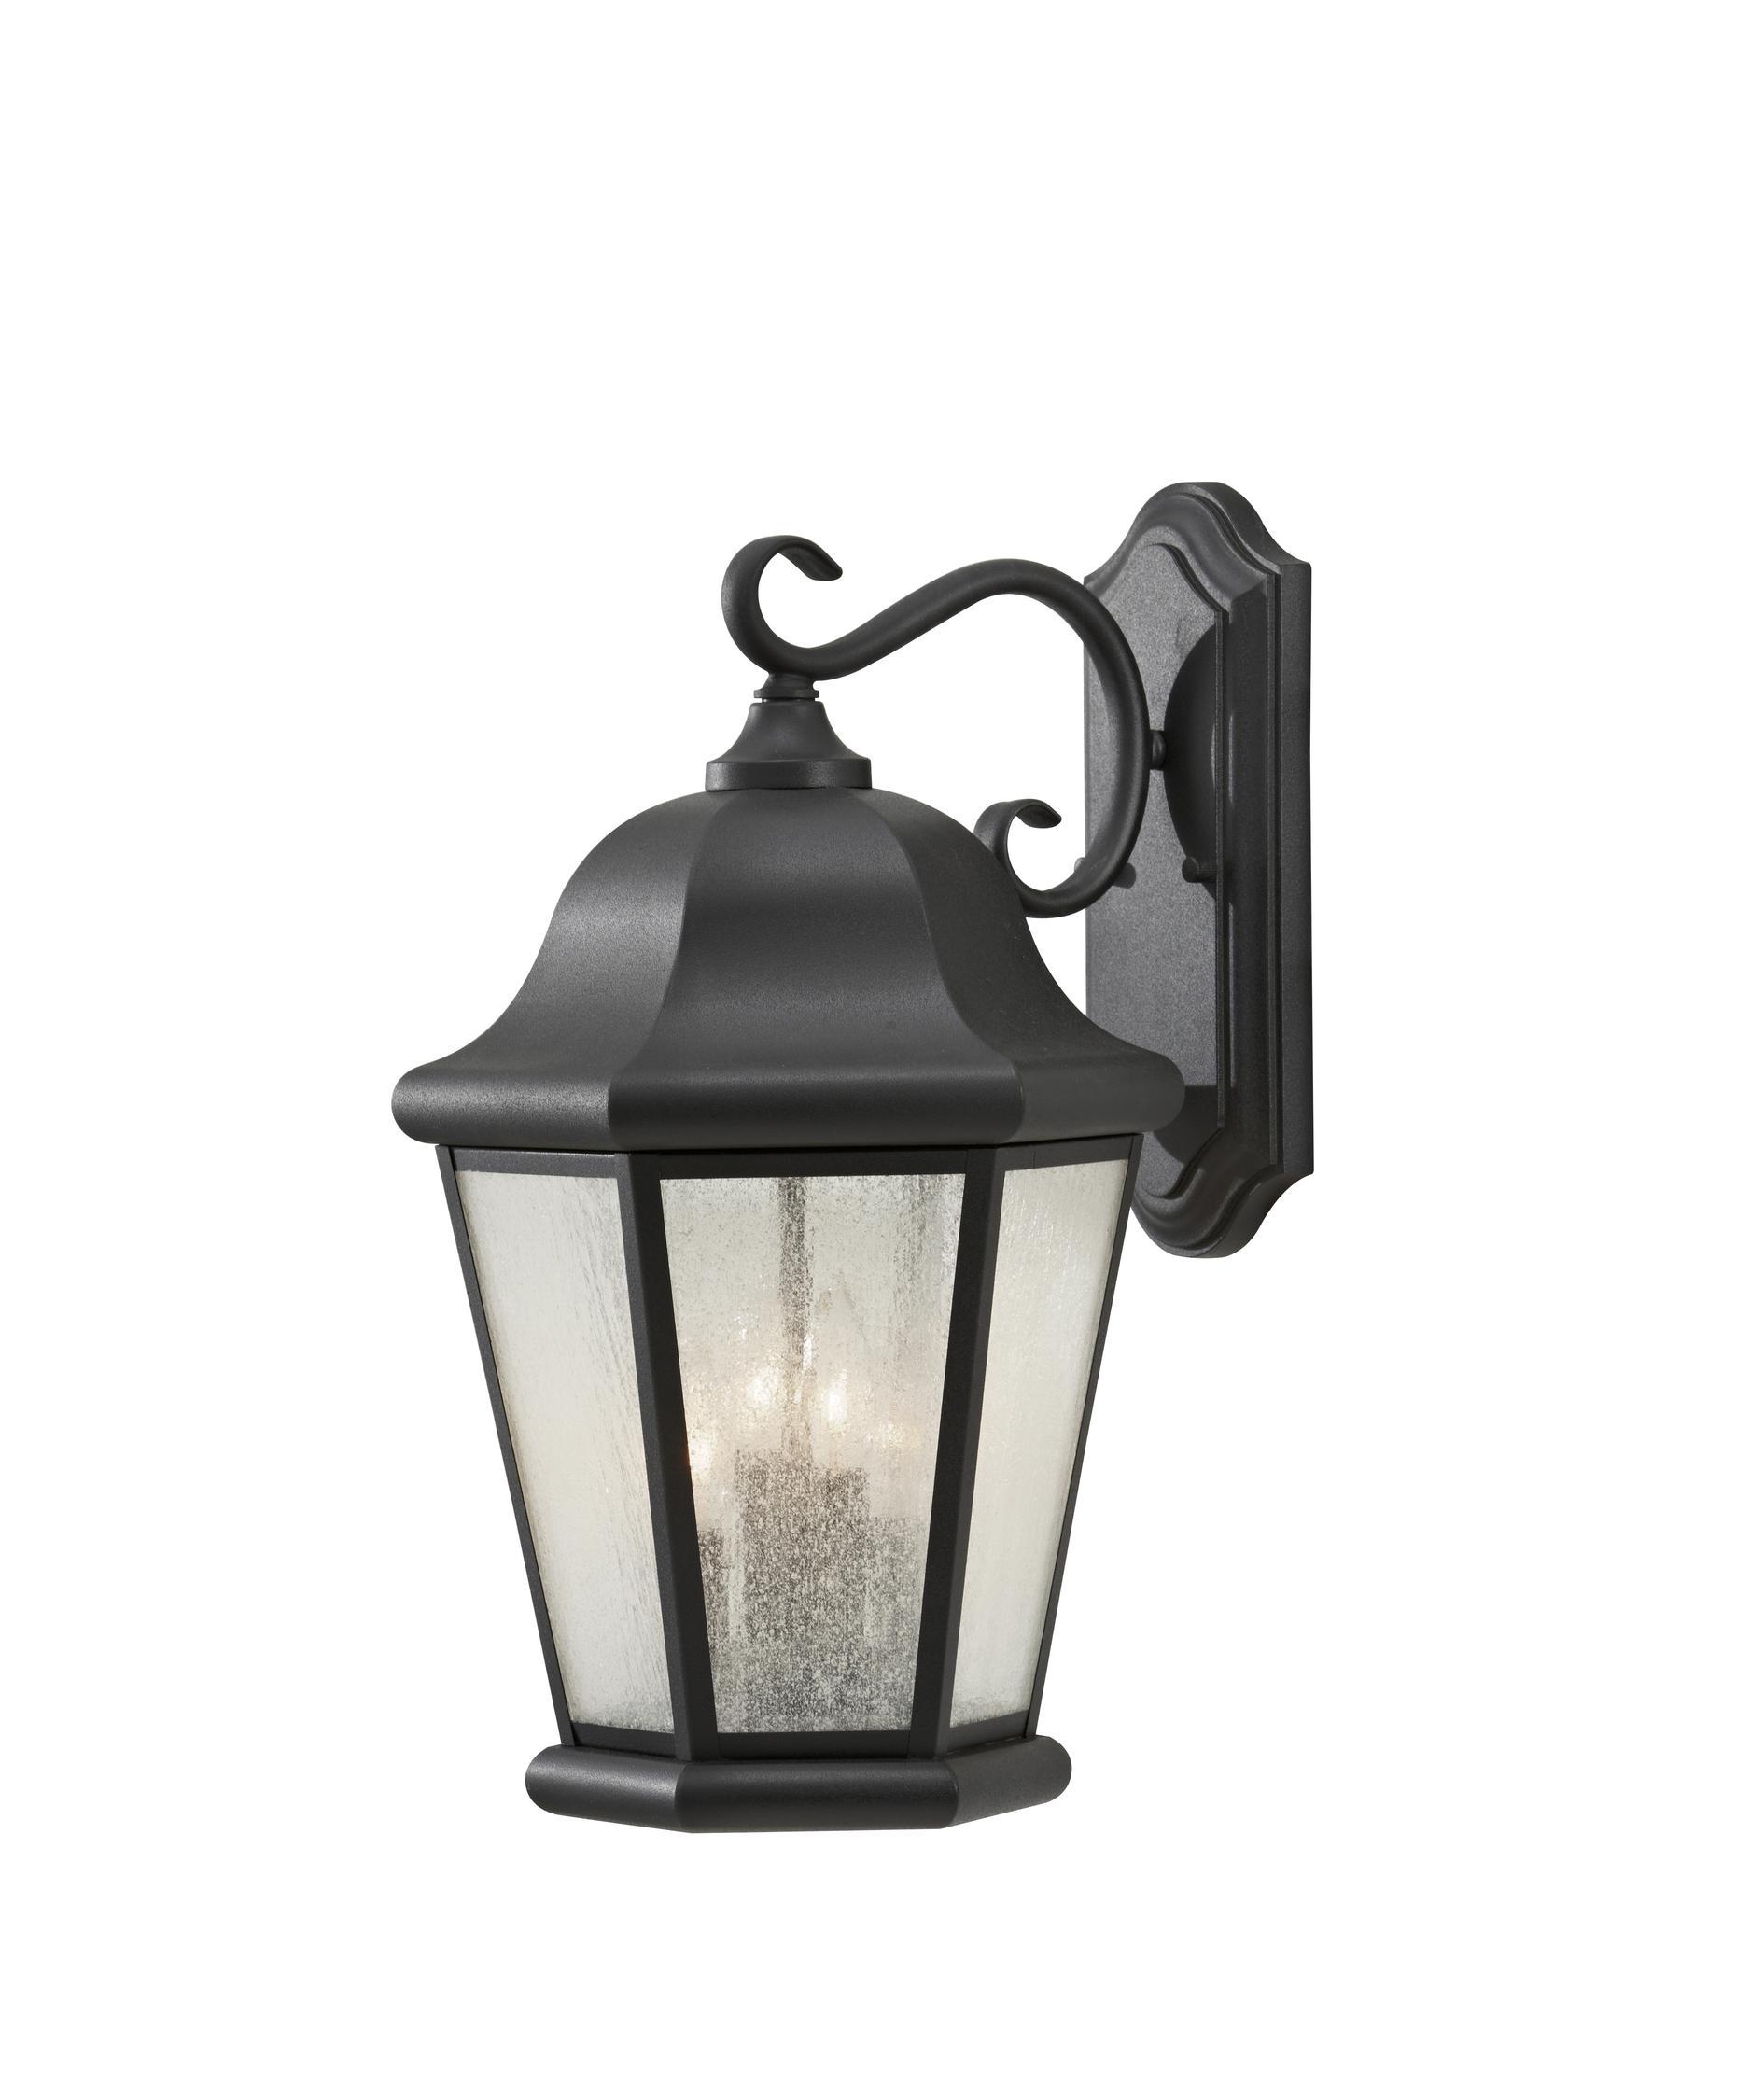 Murray Feiss Outdoor Lighting